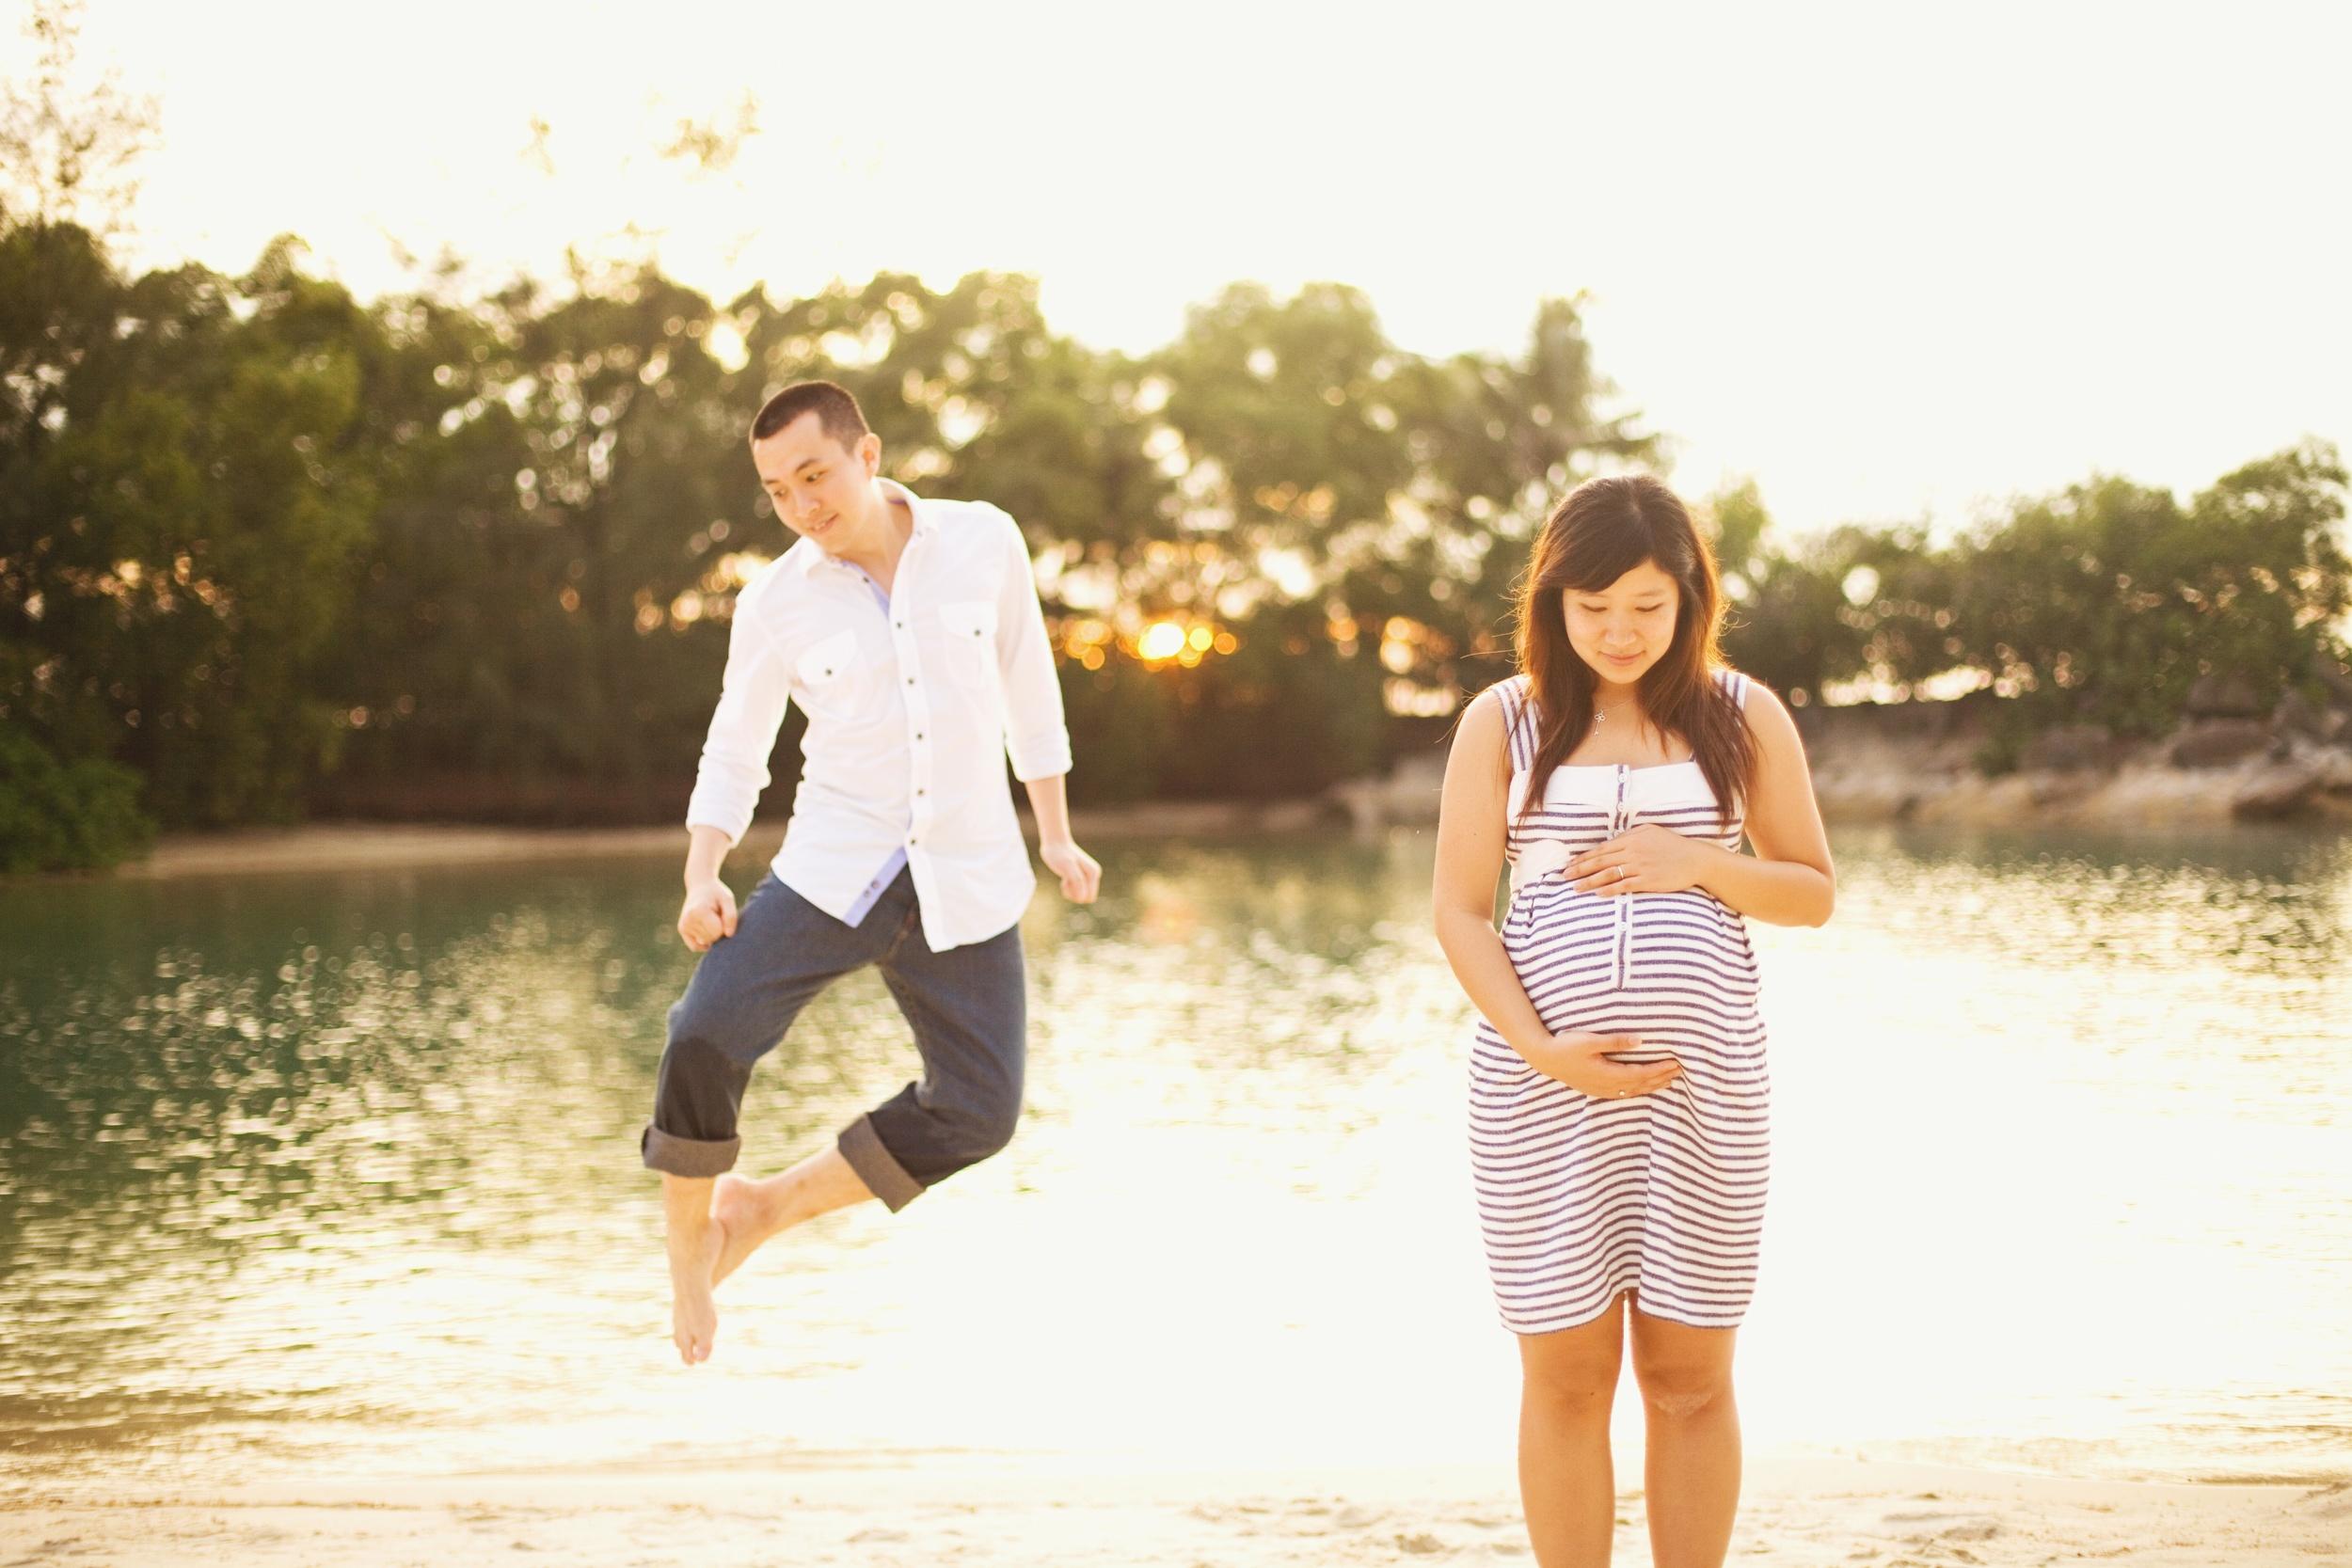 34w5d maternity photo.jpg